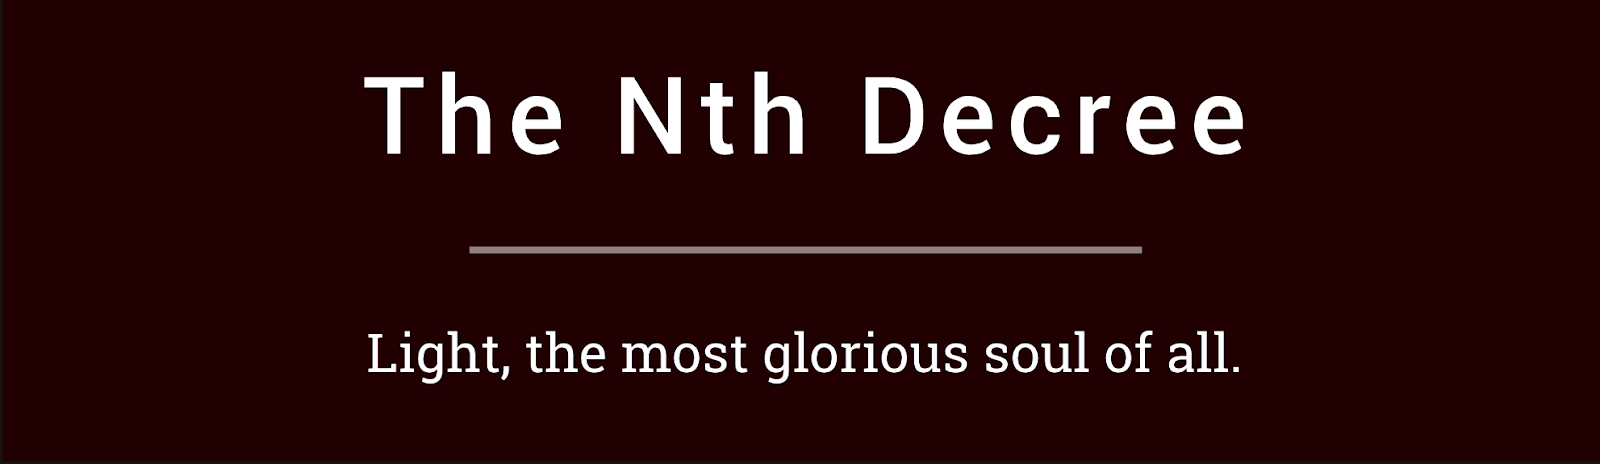 The Nth Decree